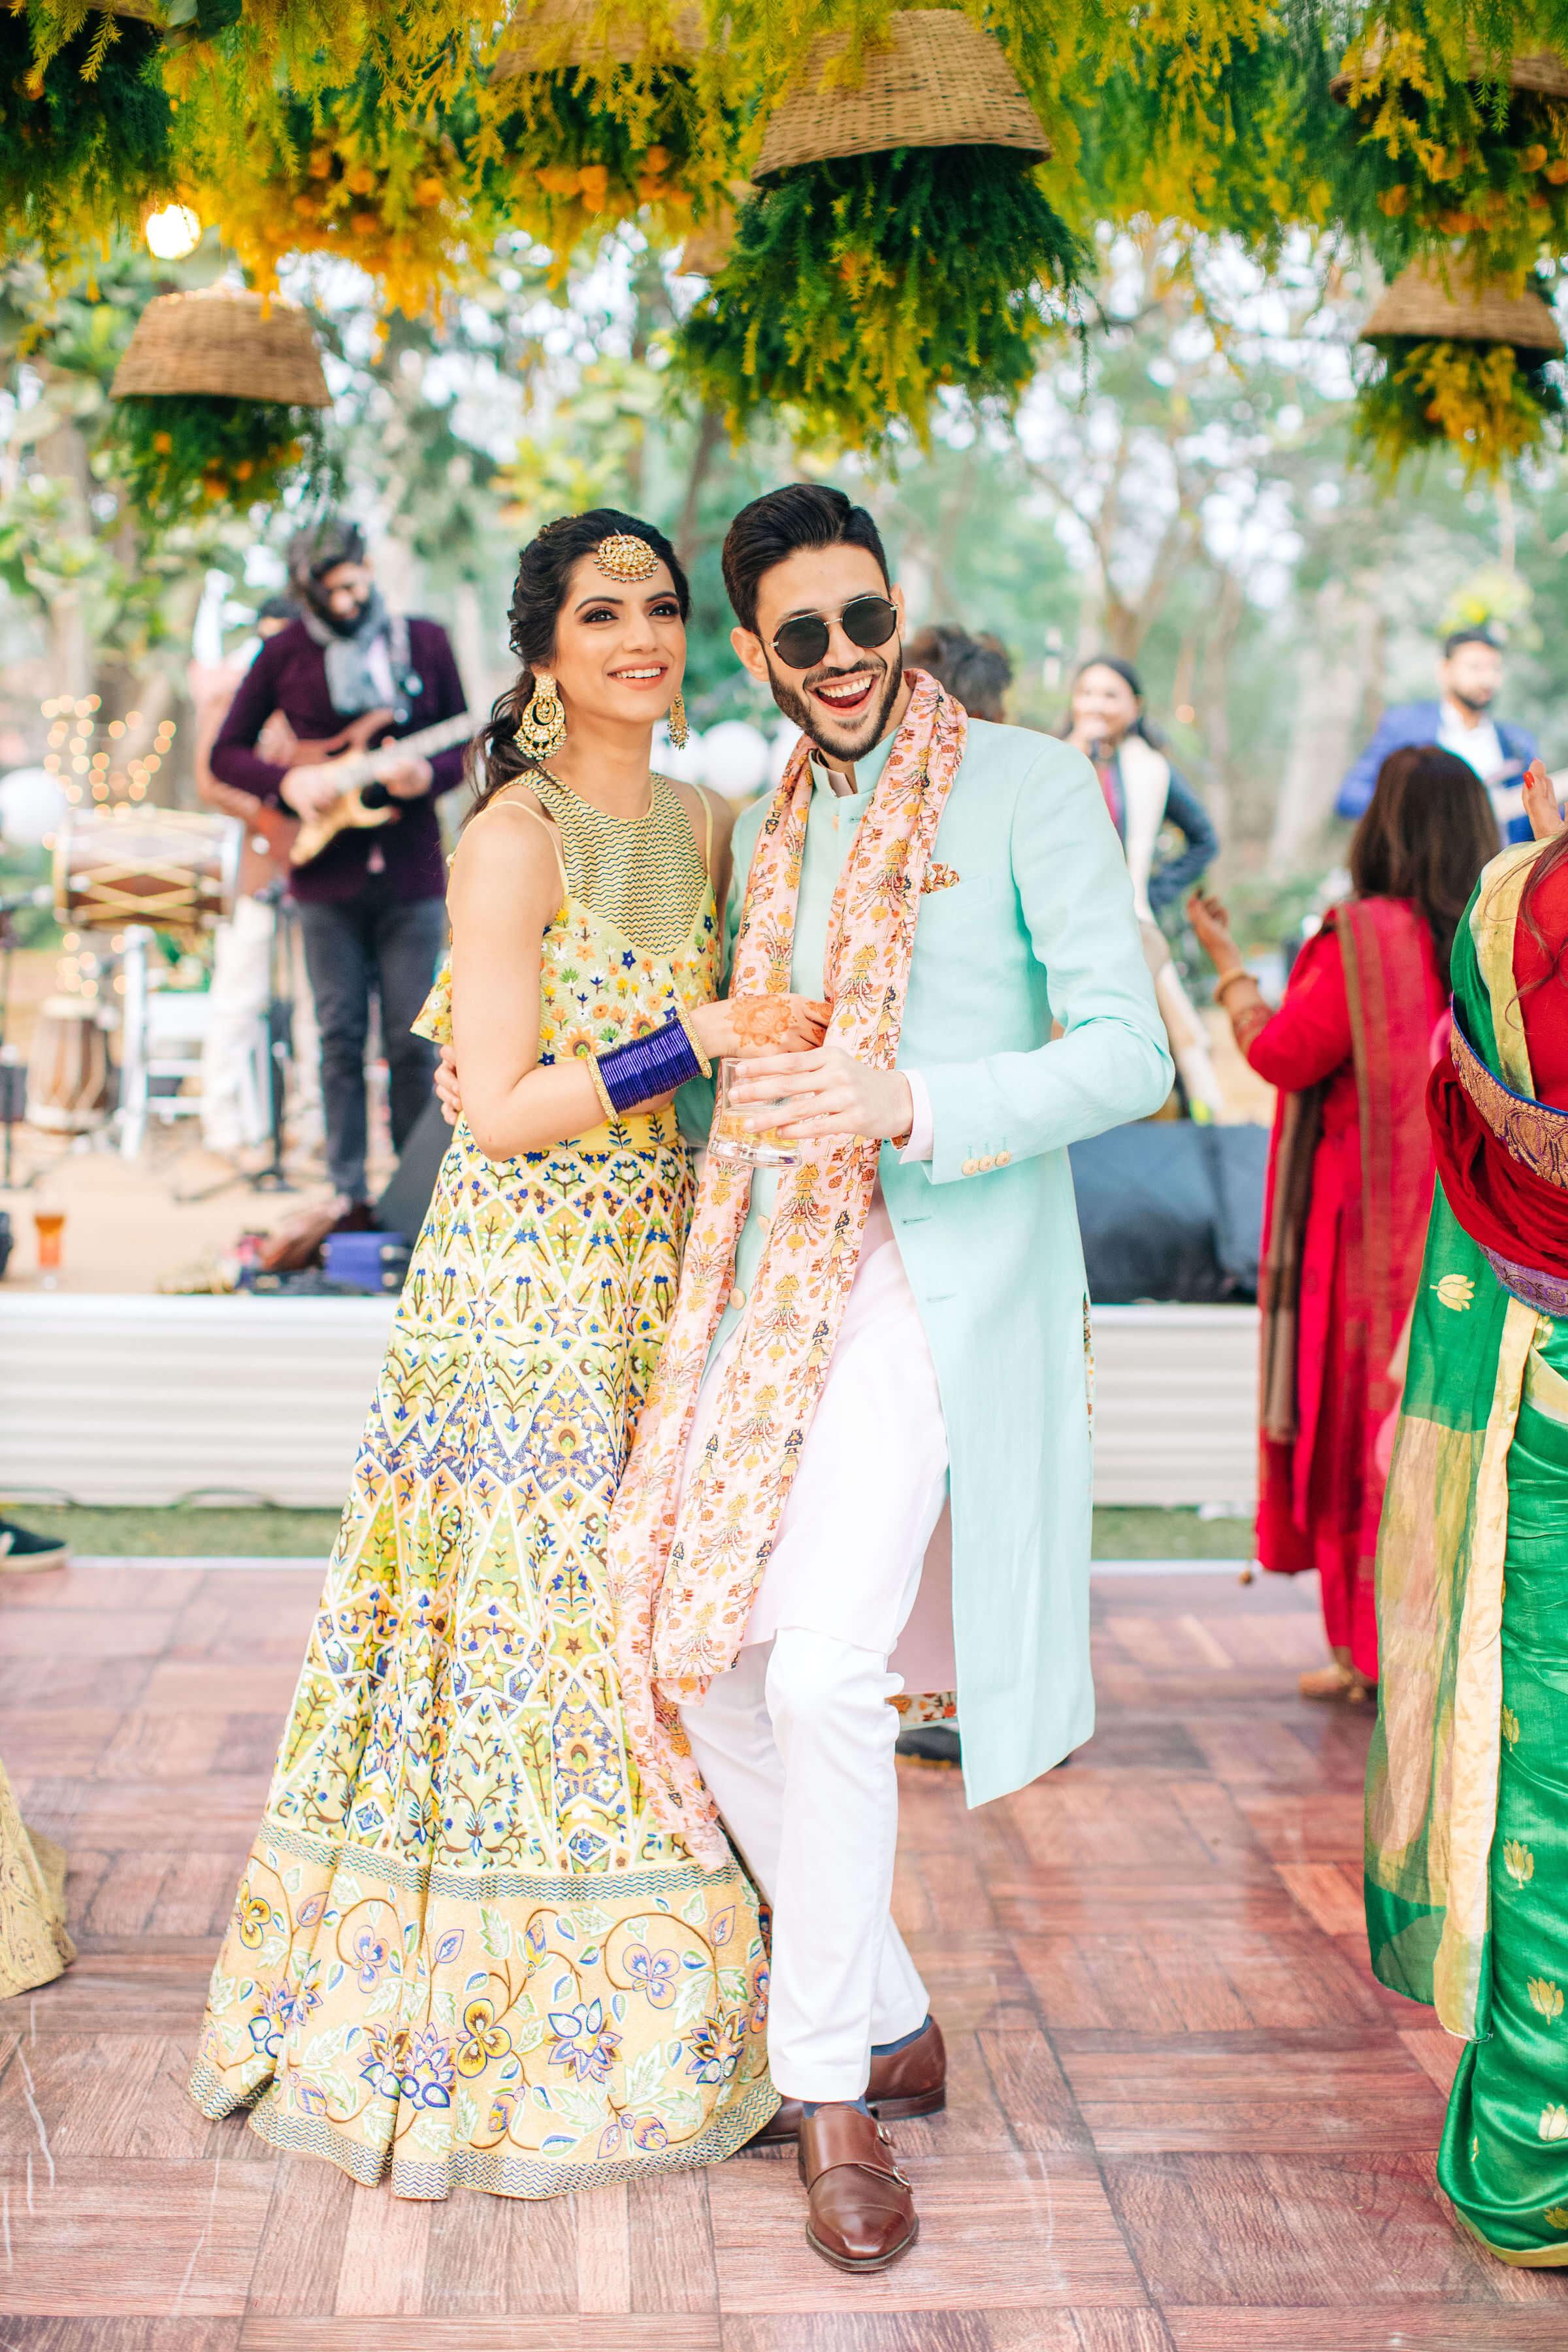 dancing couple shot